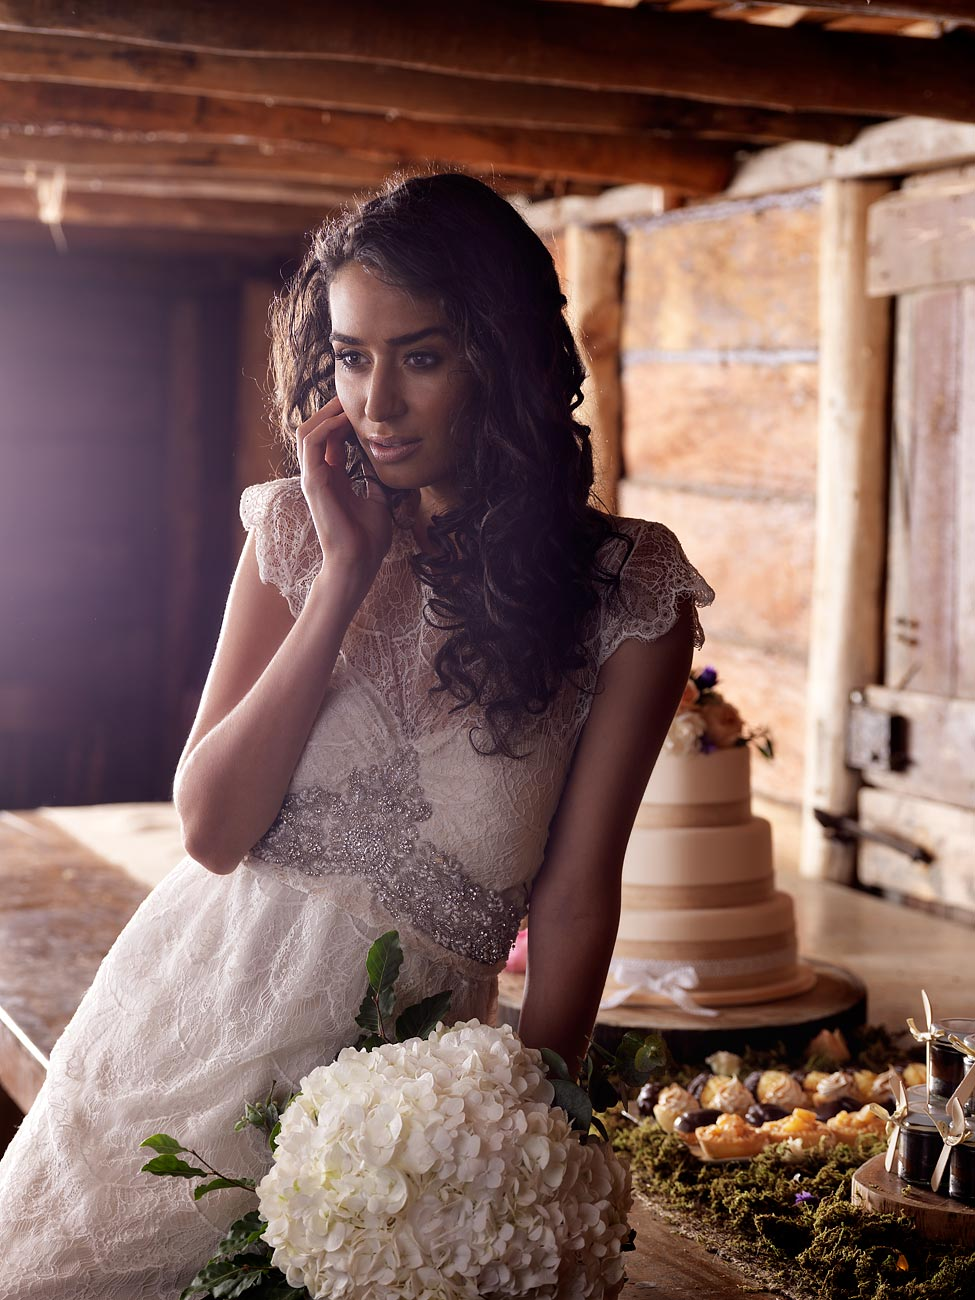 completewedding-fashion-editorial-2b.jpg